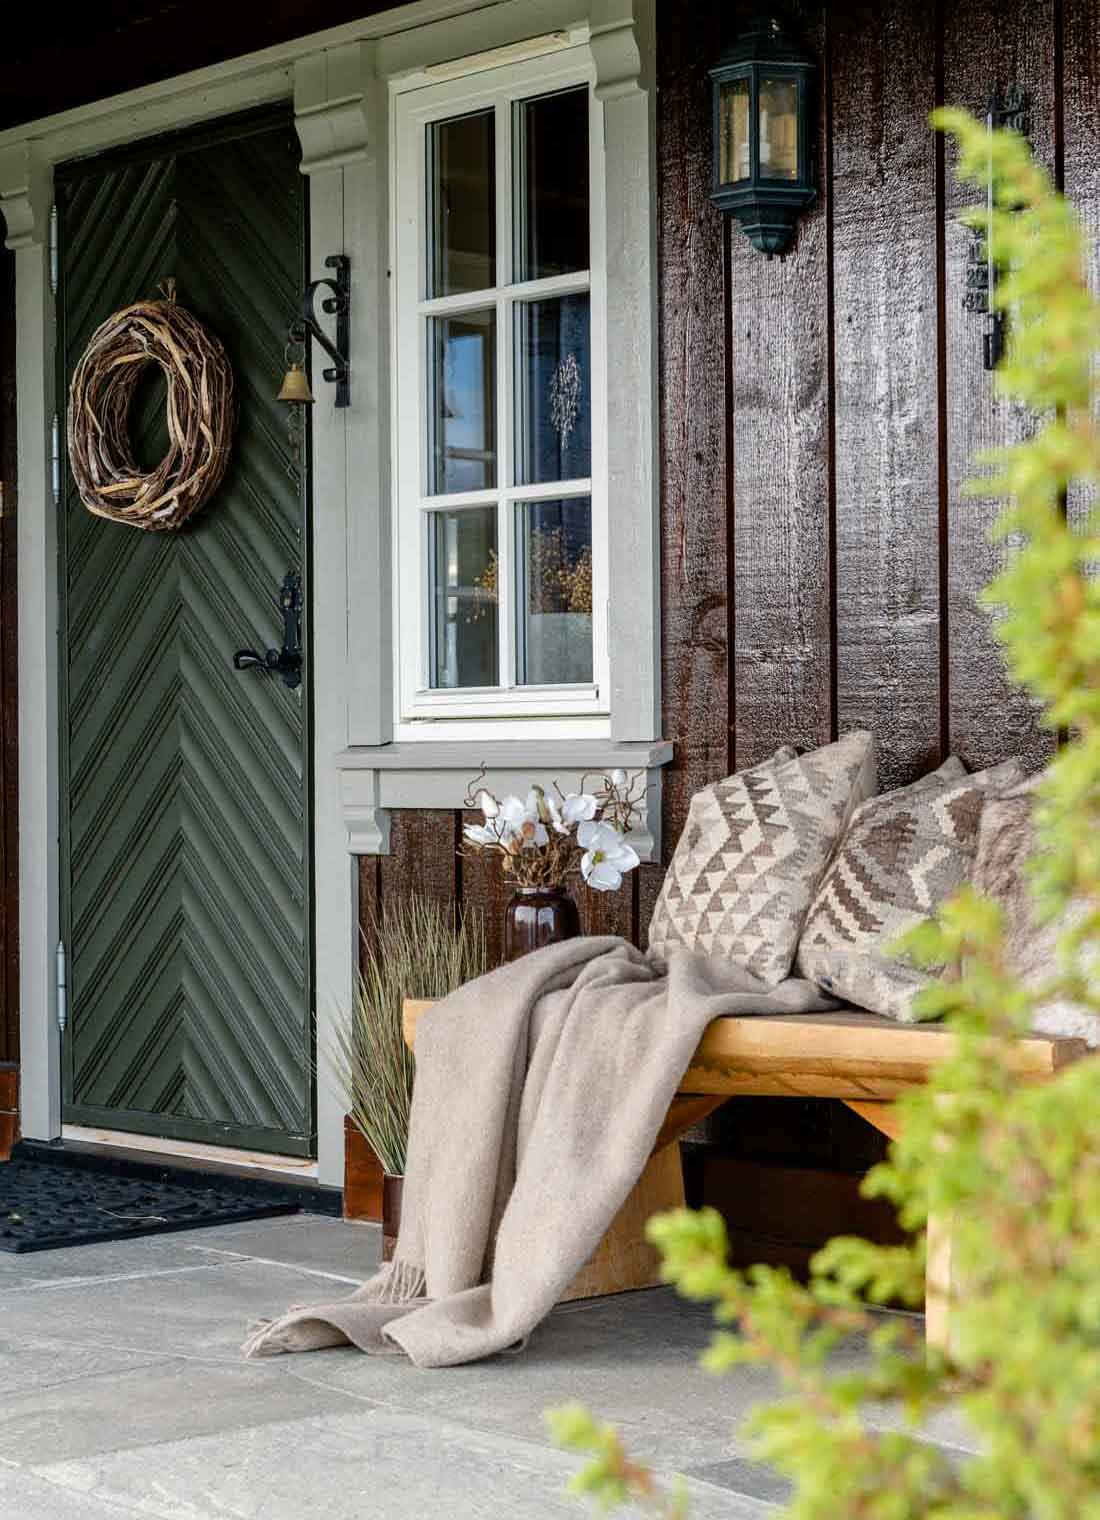 Et utvendig inngangsparti på en laftet hytte med en benk med puter. Bakken er kledt med grå bruddskifer av Oppdalskifer.